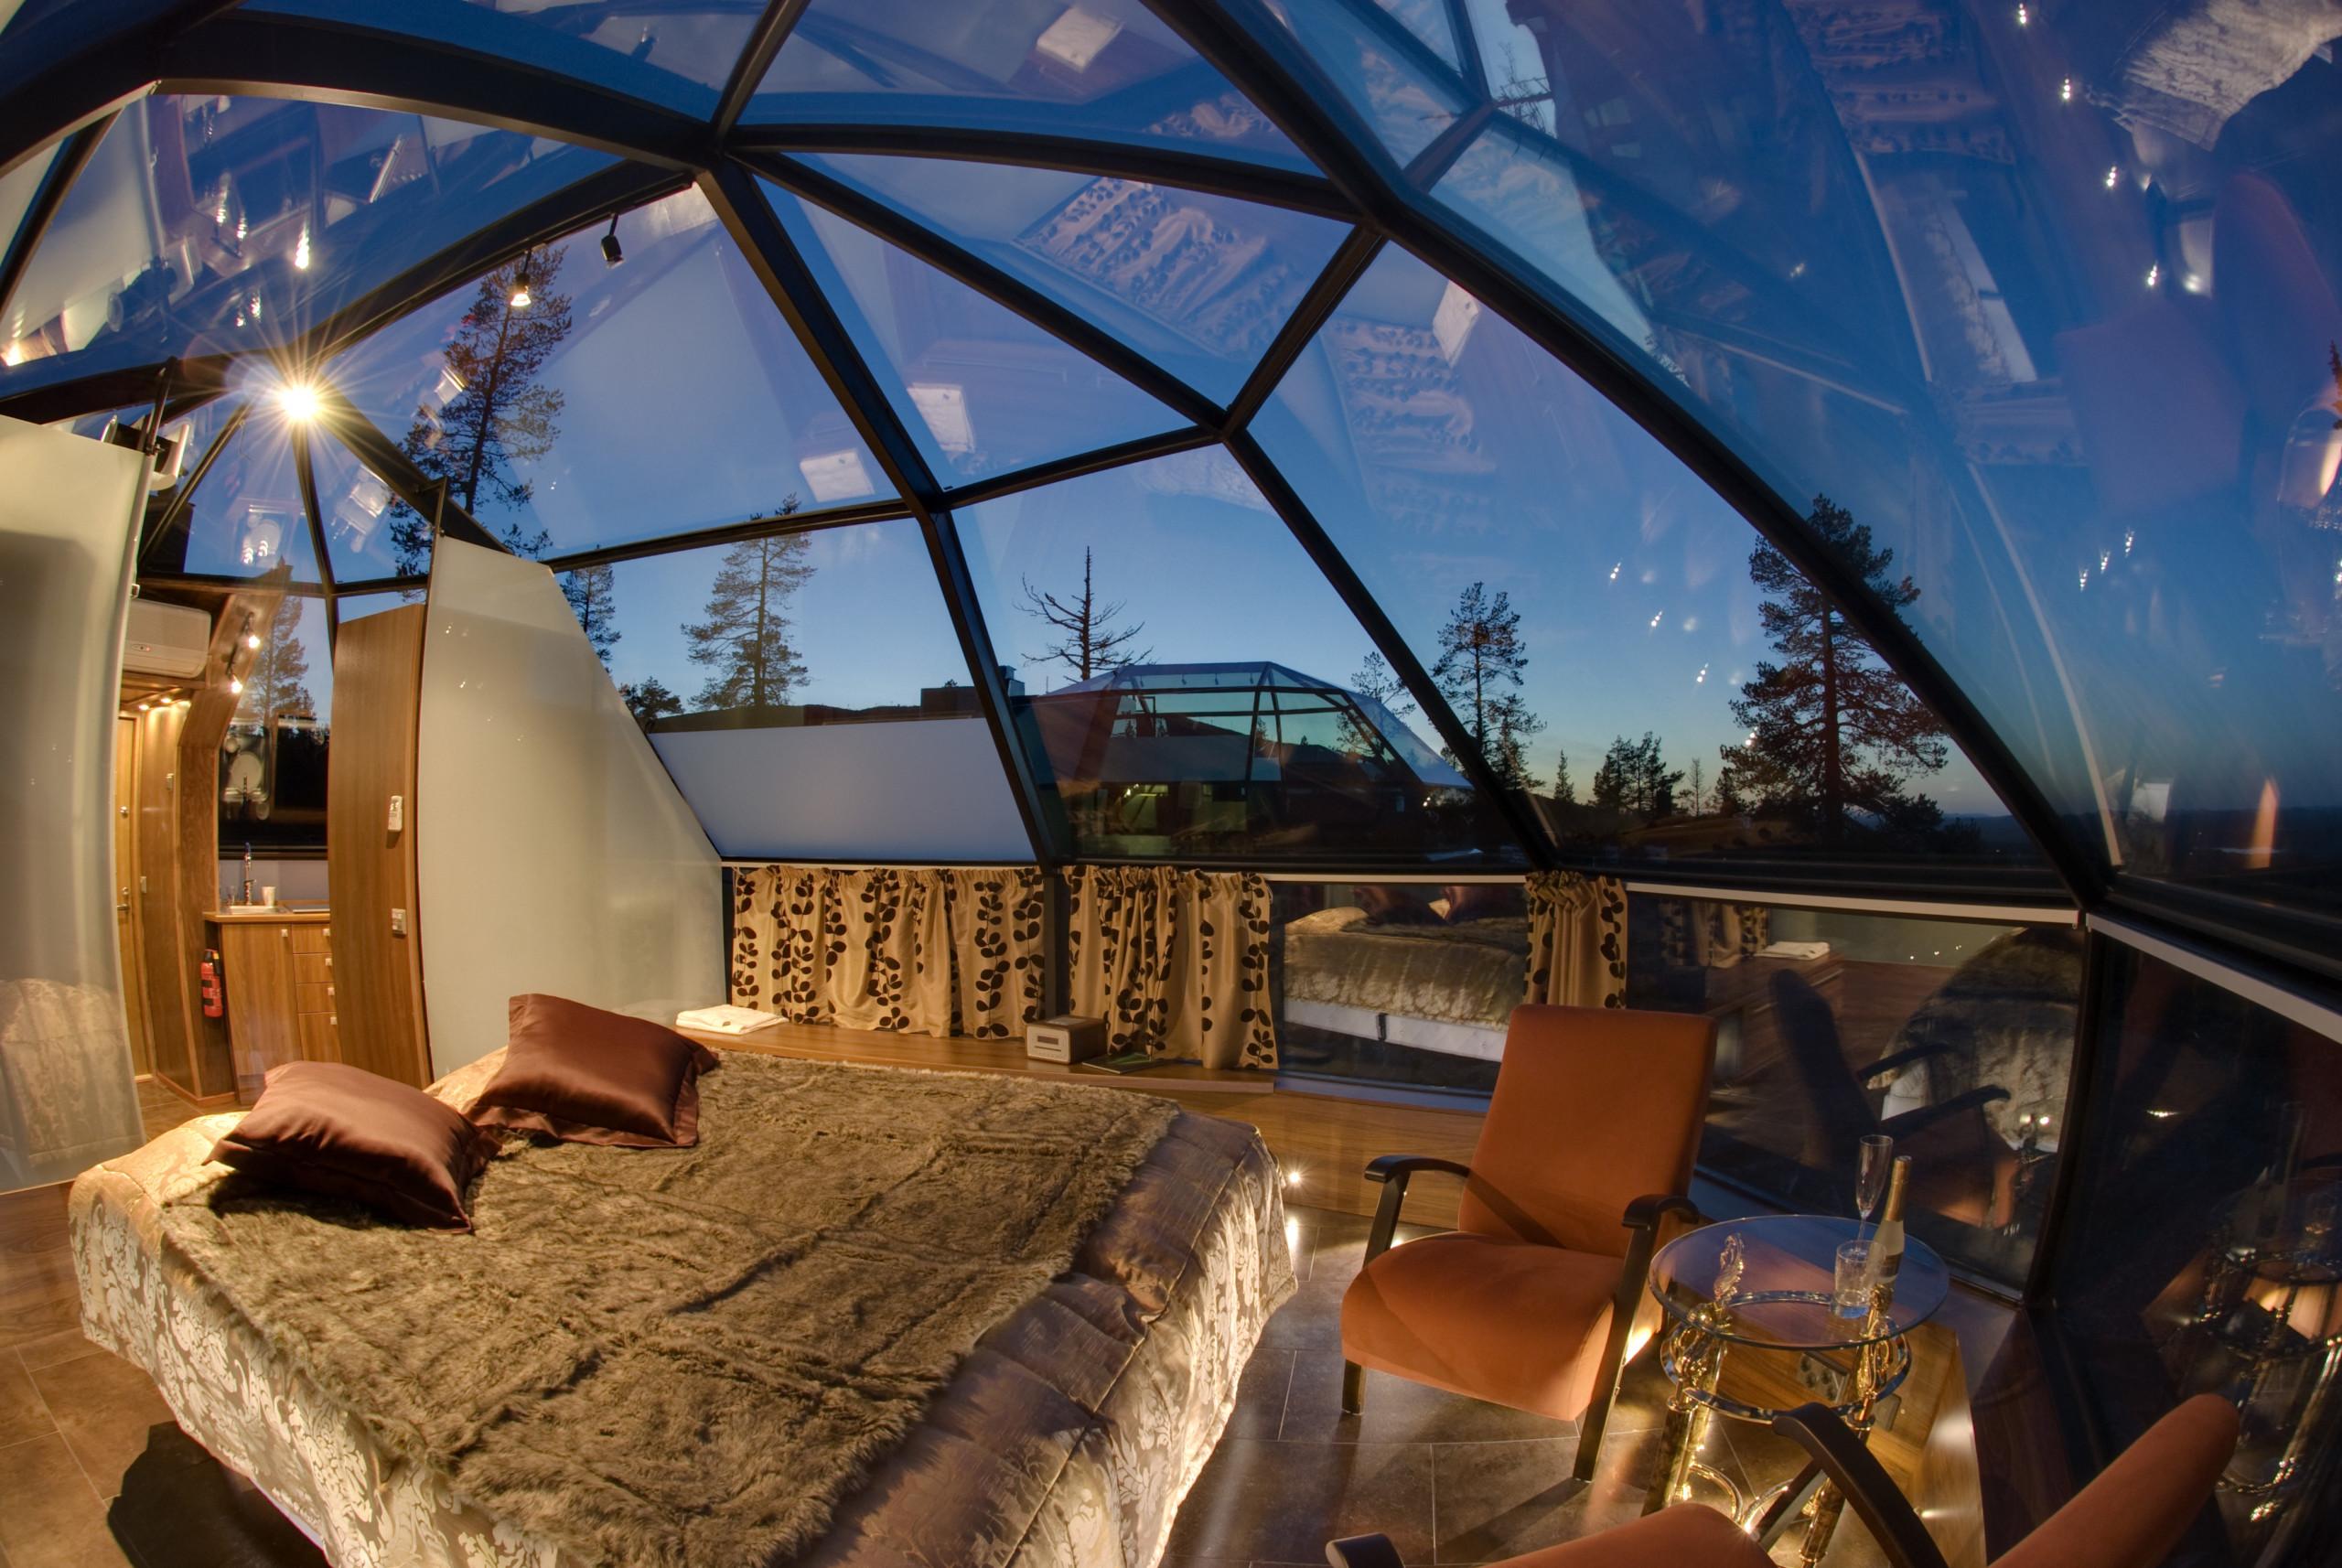 QUANTUM-GLASS_E-Glas_-Igloos-Hotel-Kakslauttanen_Saariselka_Finland_Visual-11__Juha-Lisakki-Koivisto